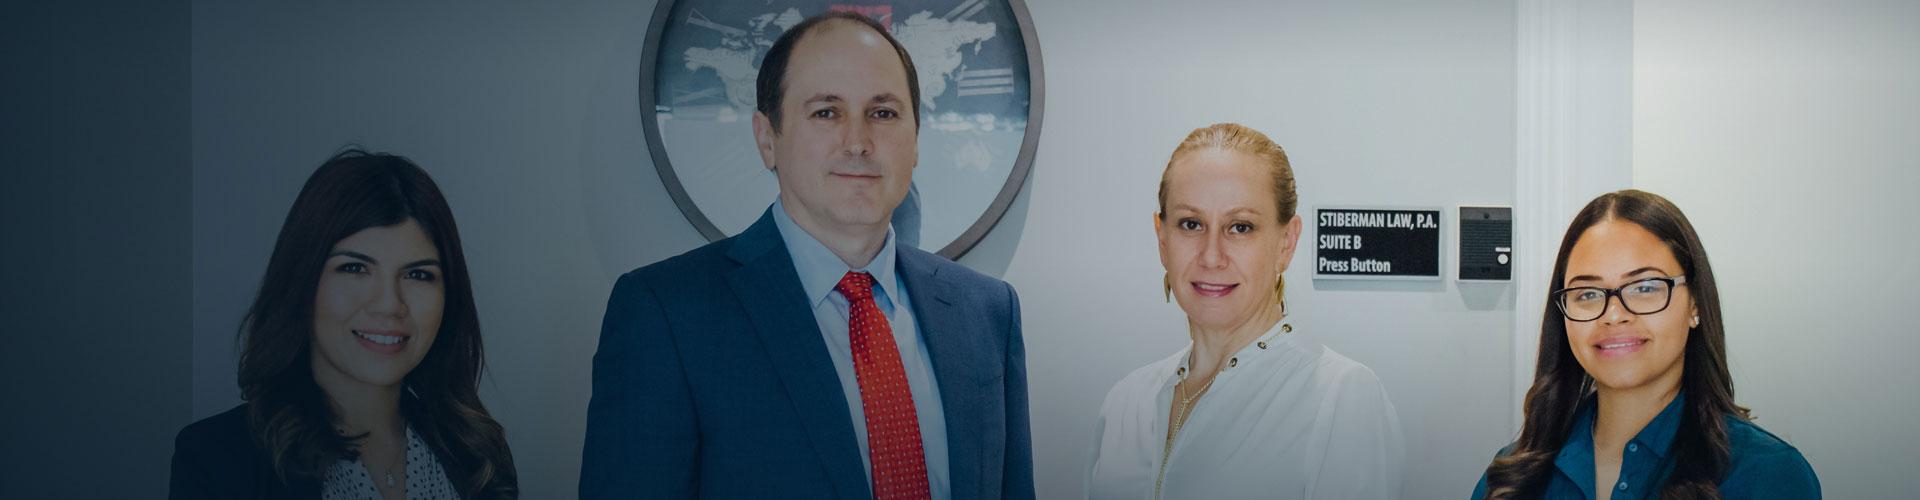 Palm Beach Loan Modification Attorneys - Stiberman Law Firm